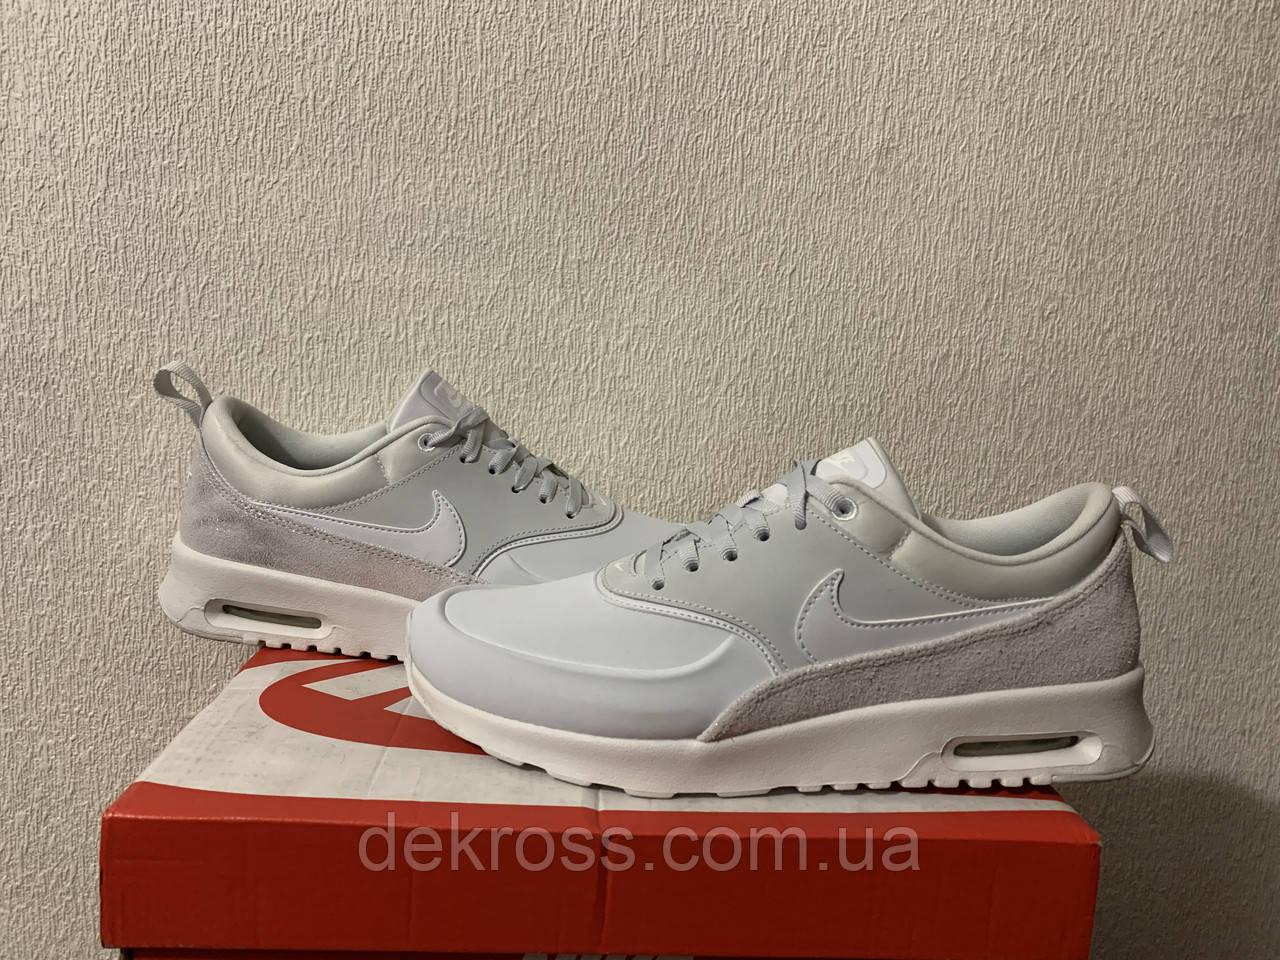 Кроссовки Nike Air Max Thea Оригинал 616723-026